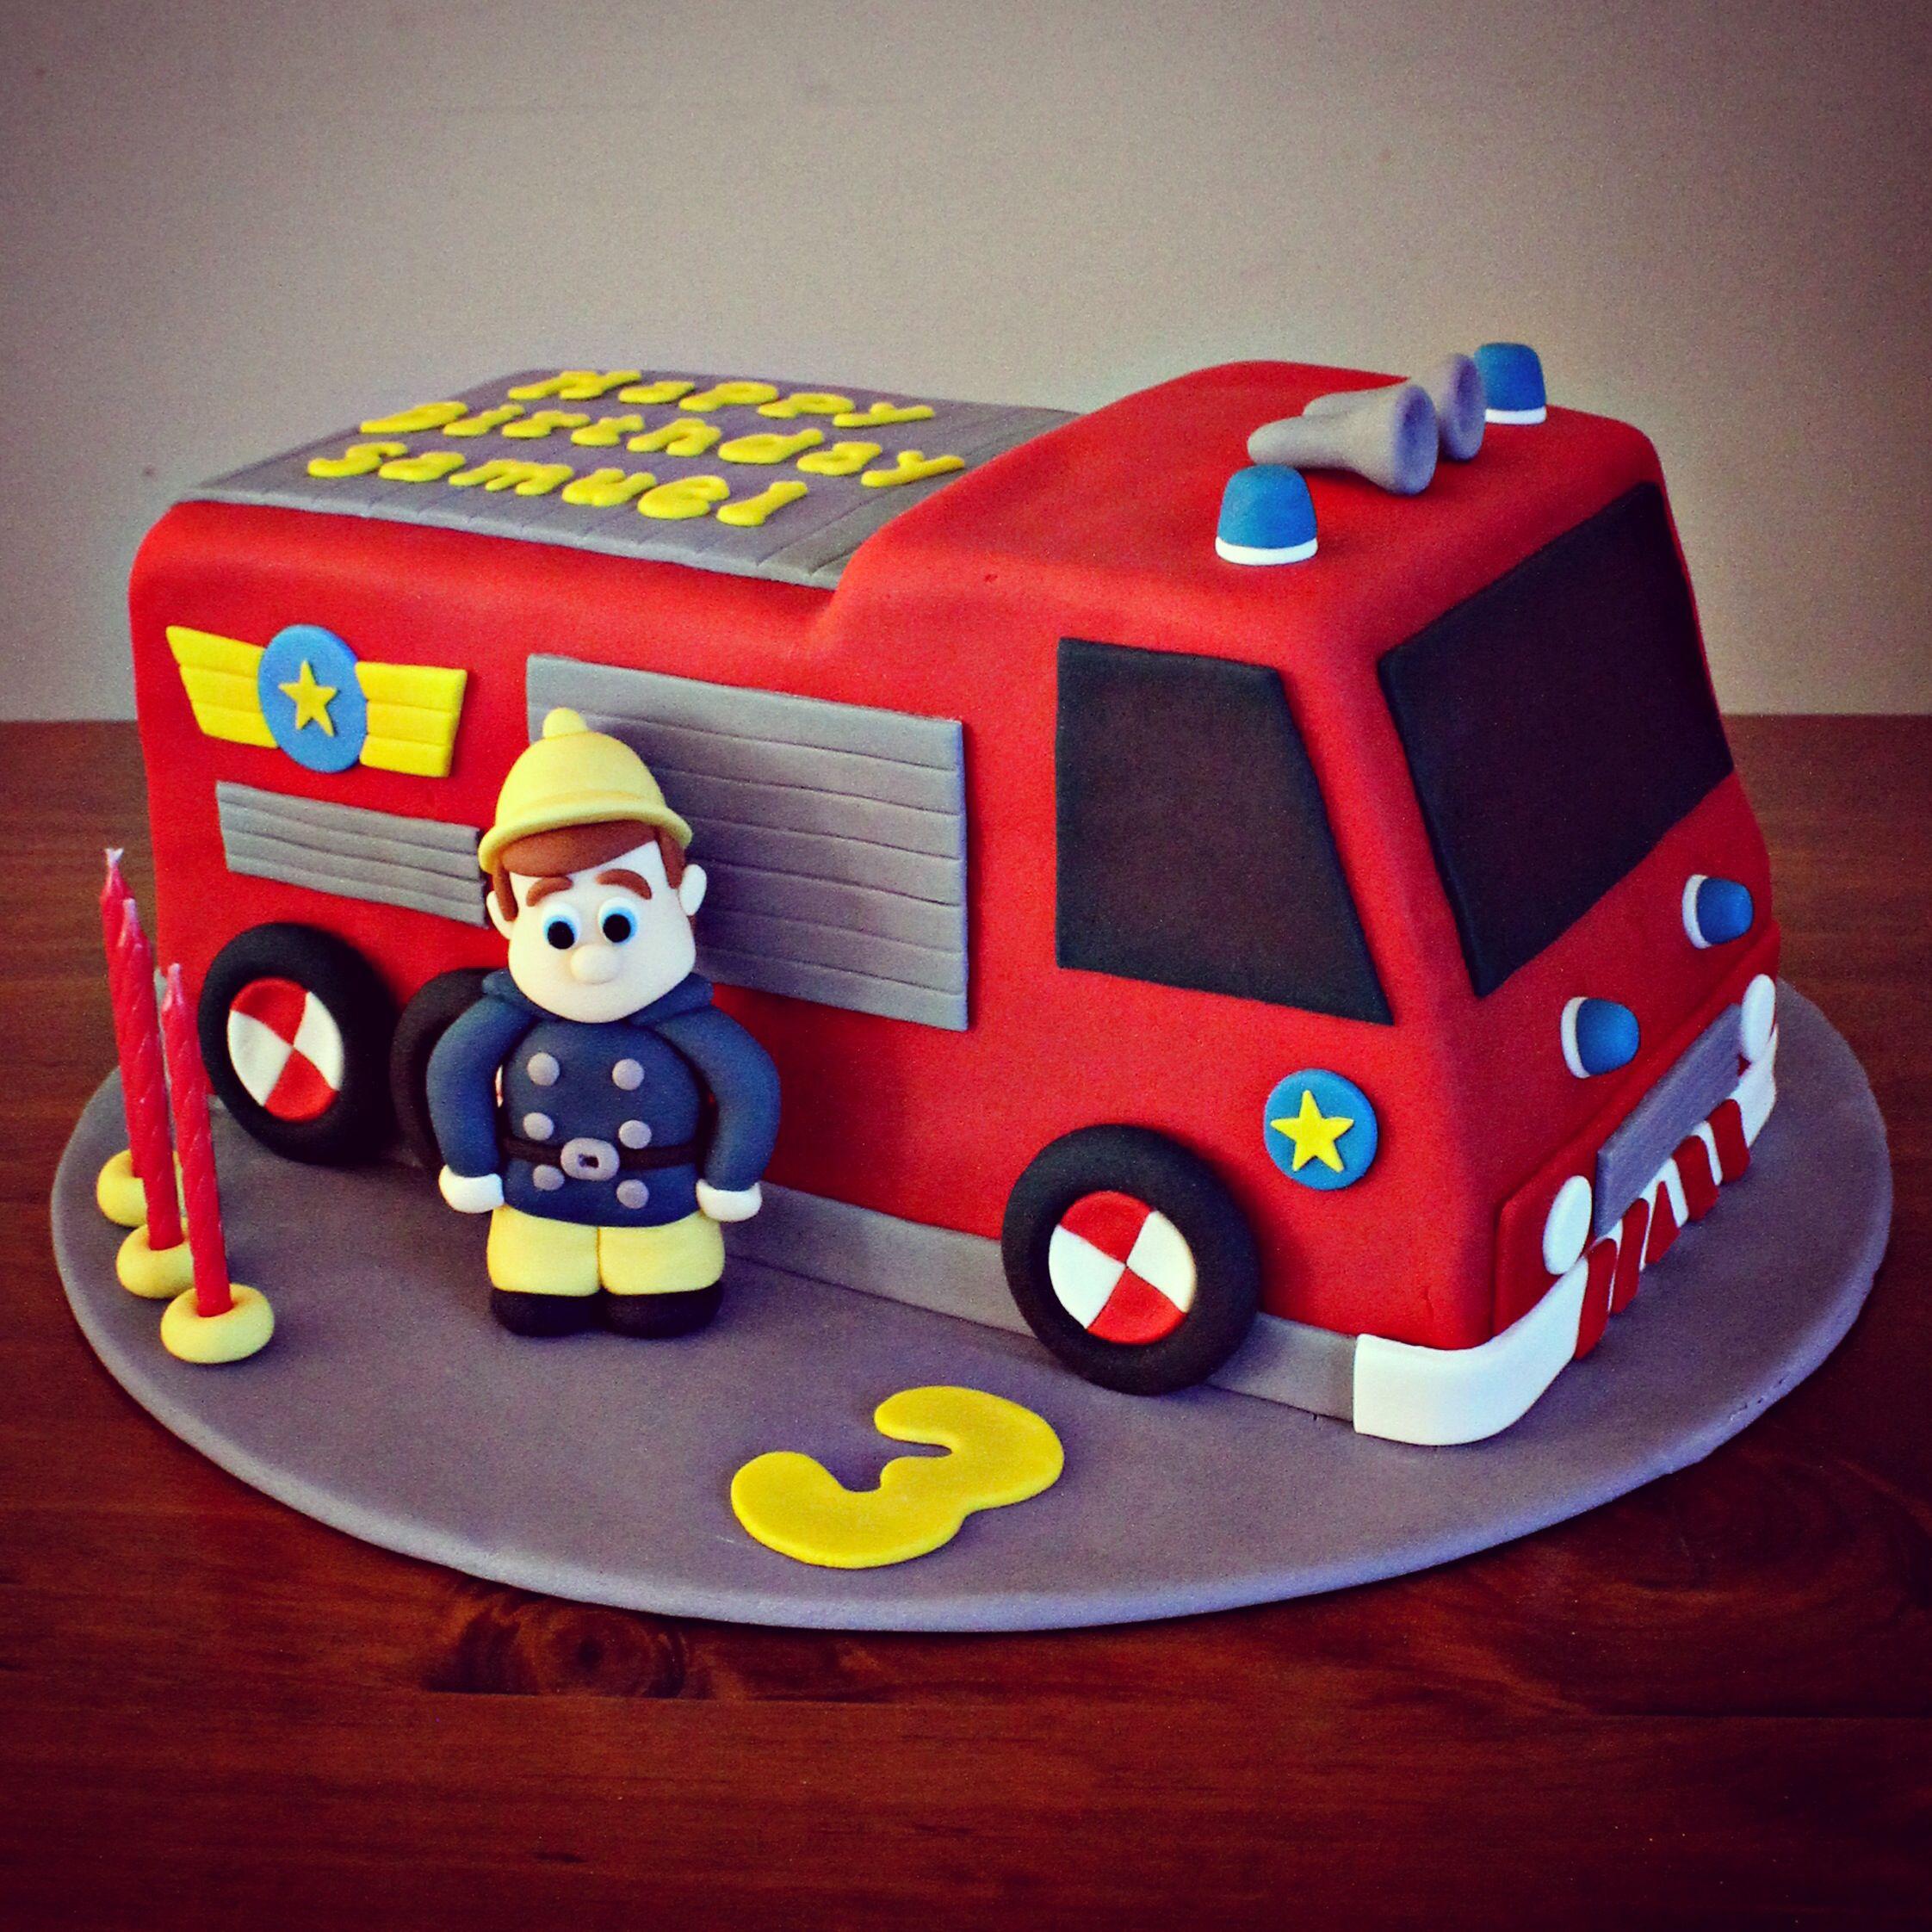 fireman sam cake cakes fireman sam cake cake fireman cake